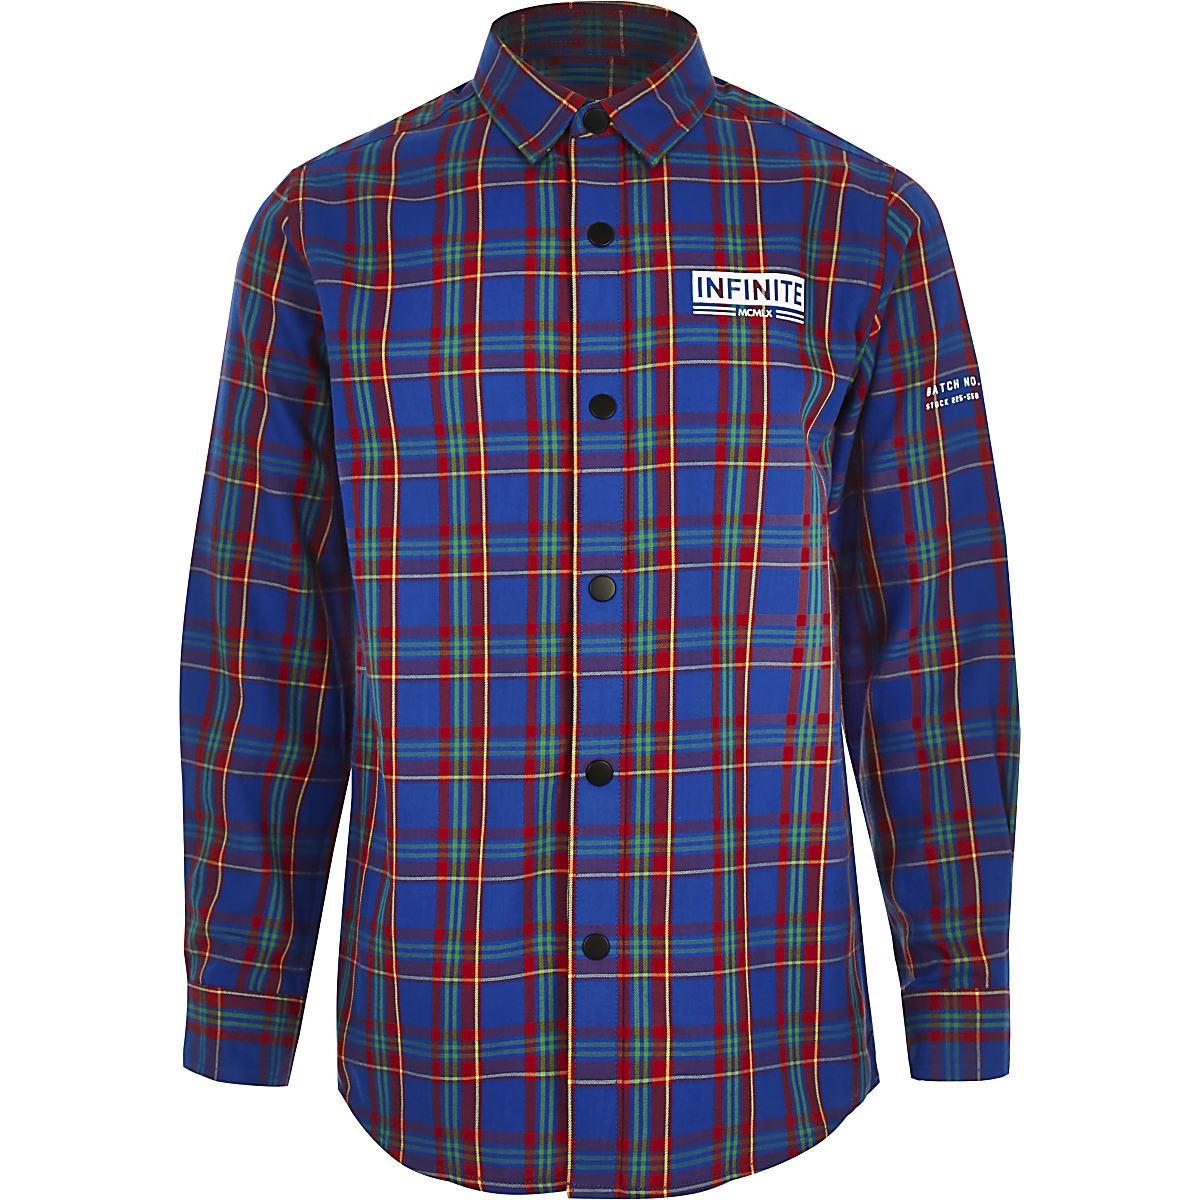 Boys blue 'Infinite' check shirt